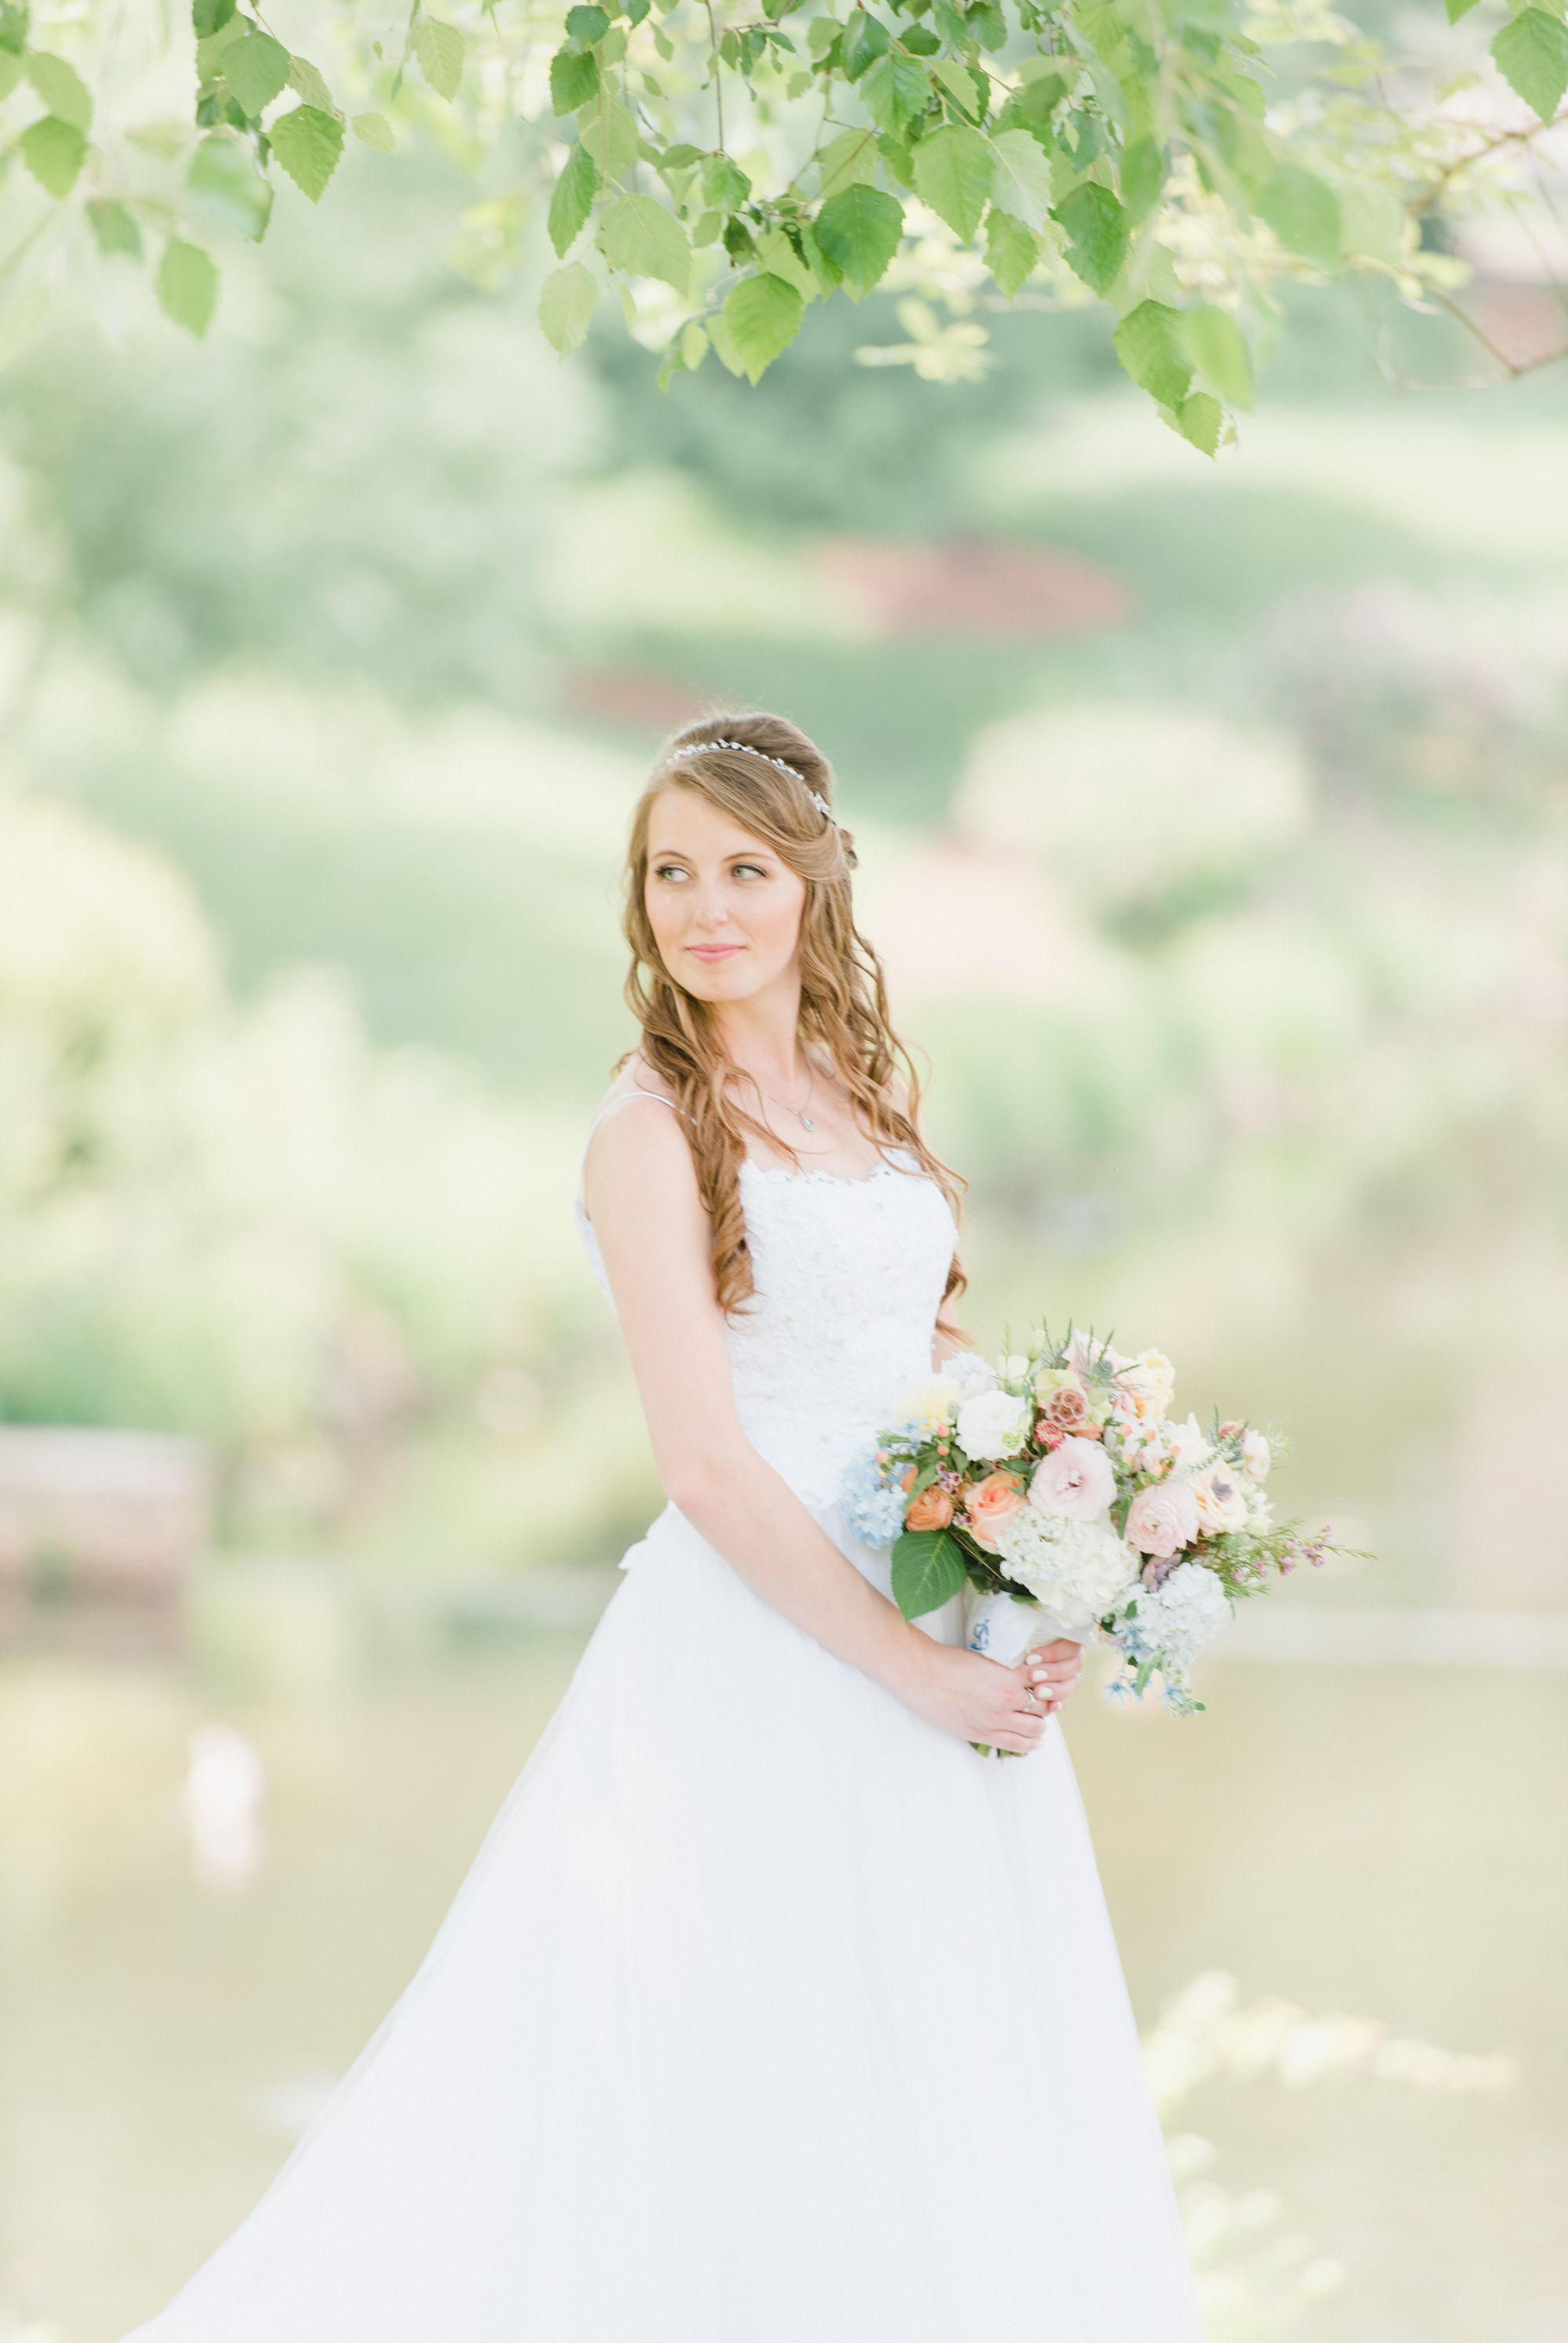 uptown-charlotte-orthodox-greek-wedding 46